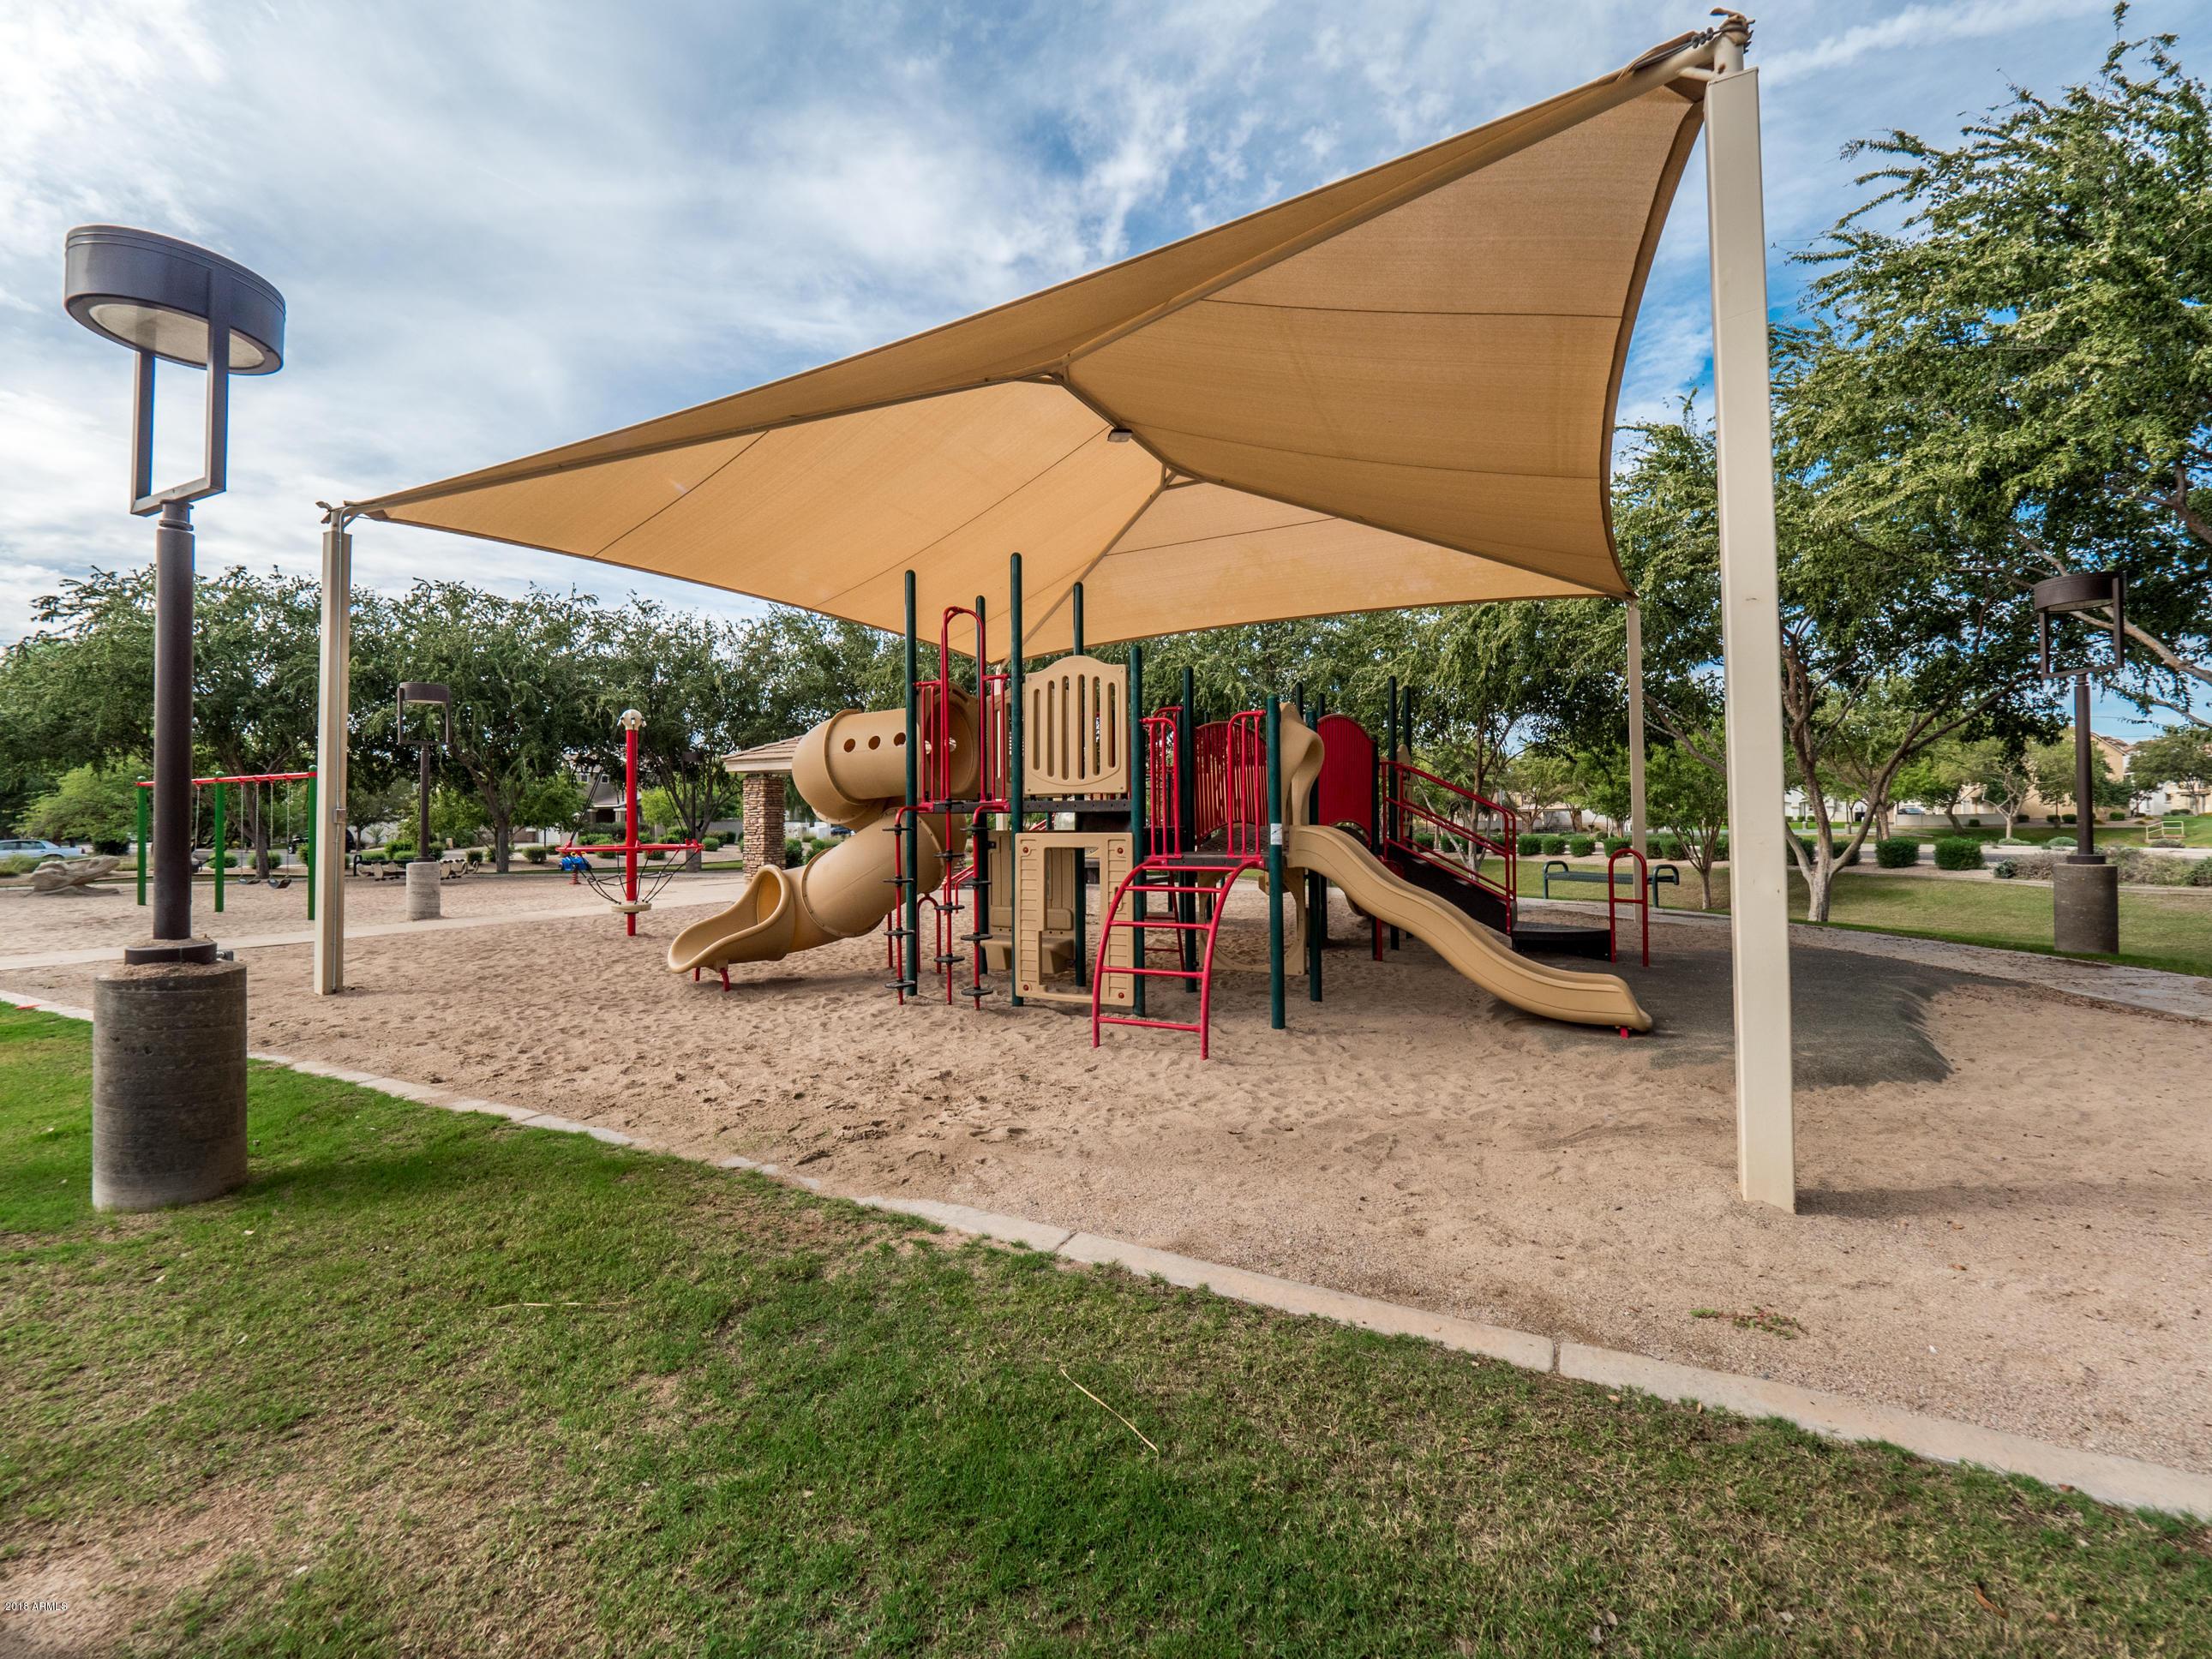 MLS 5840601 1409 S PHEASANT Drive, Gilbert, AZ 85296 Gilbert AZ The Gardens